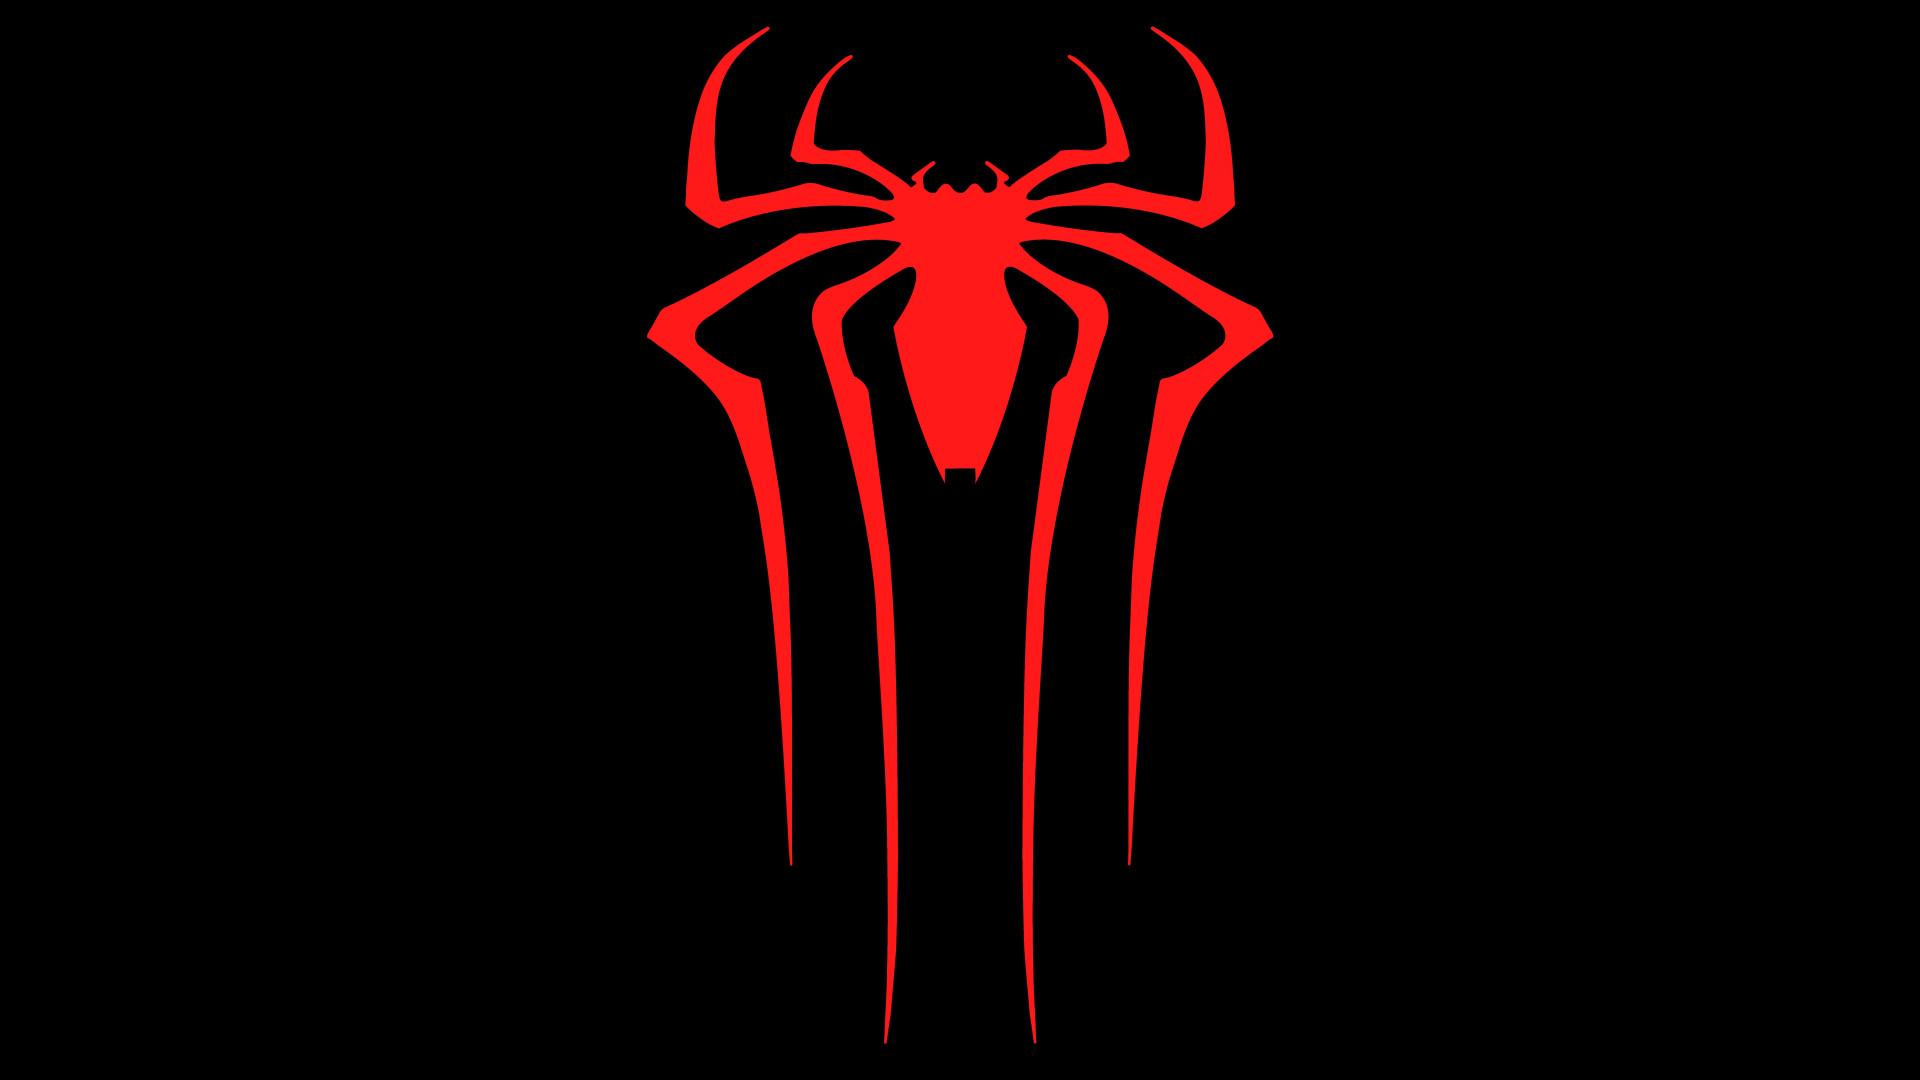 1920x1080 Spiderman Logo 8k Laptop Full HD 1080P HD 4k.